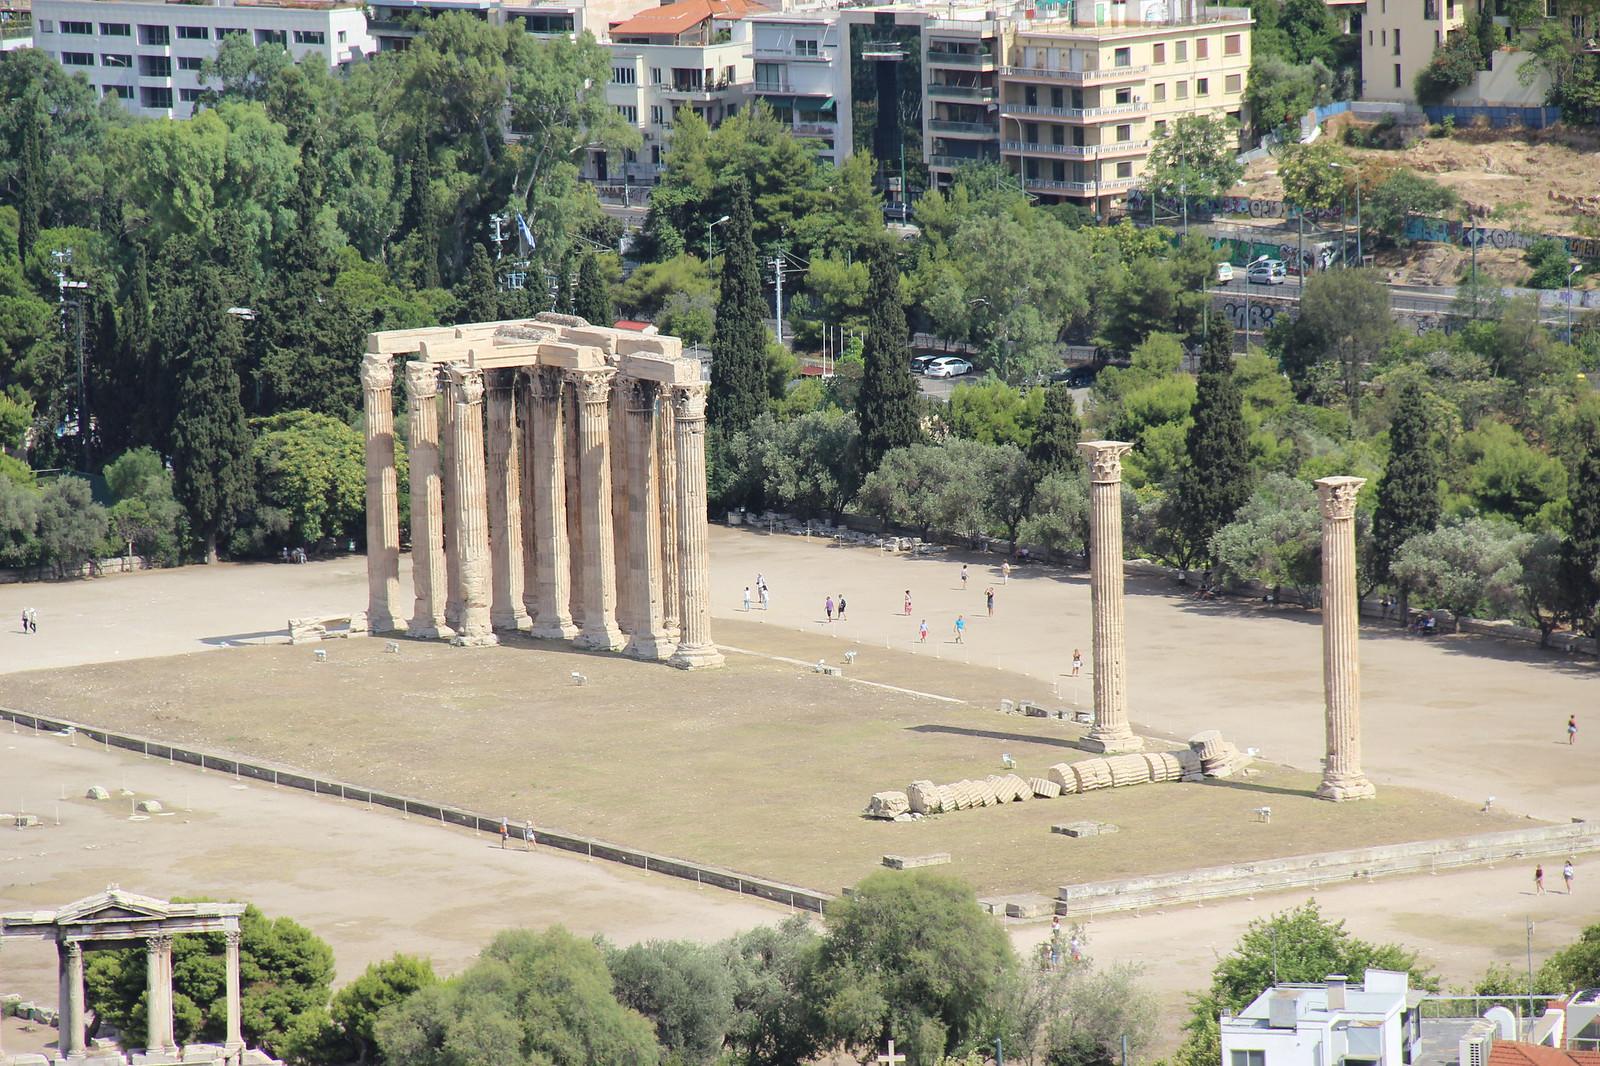 Acropolis View of Temple of Olympian Zeus